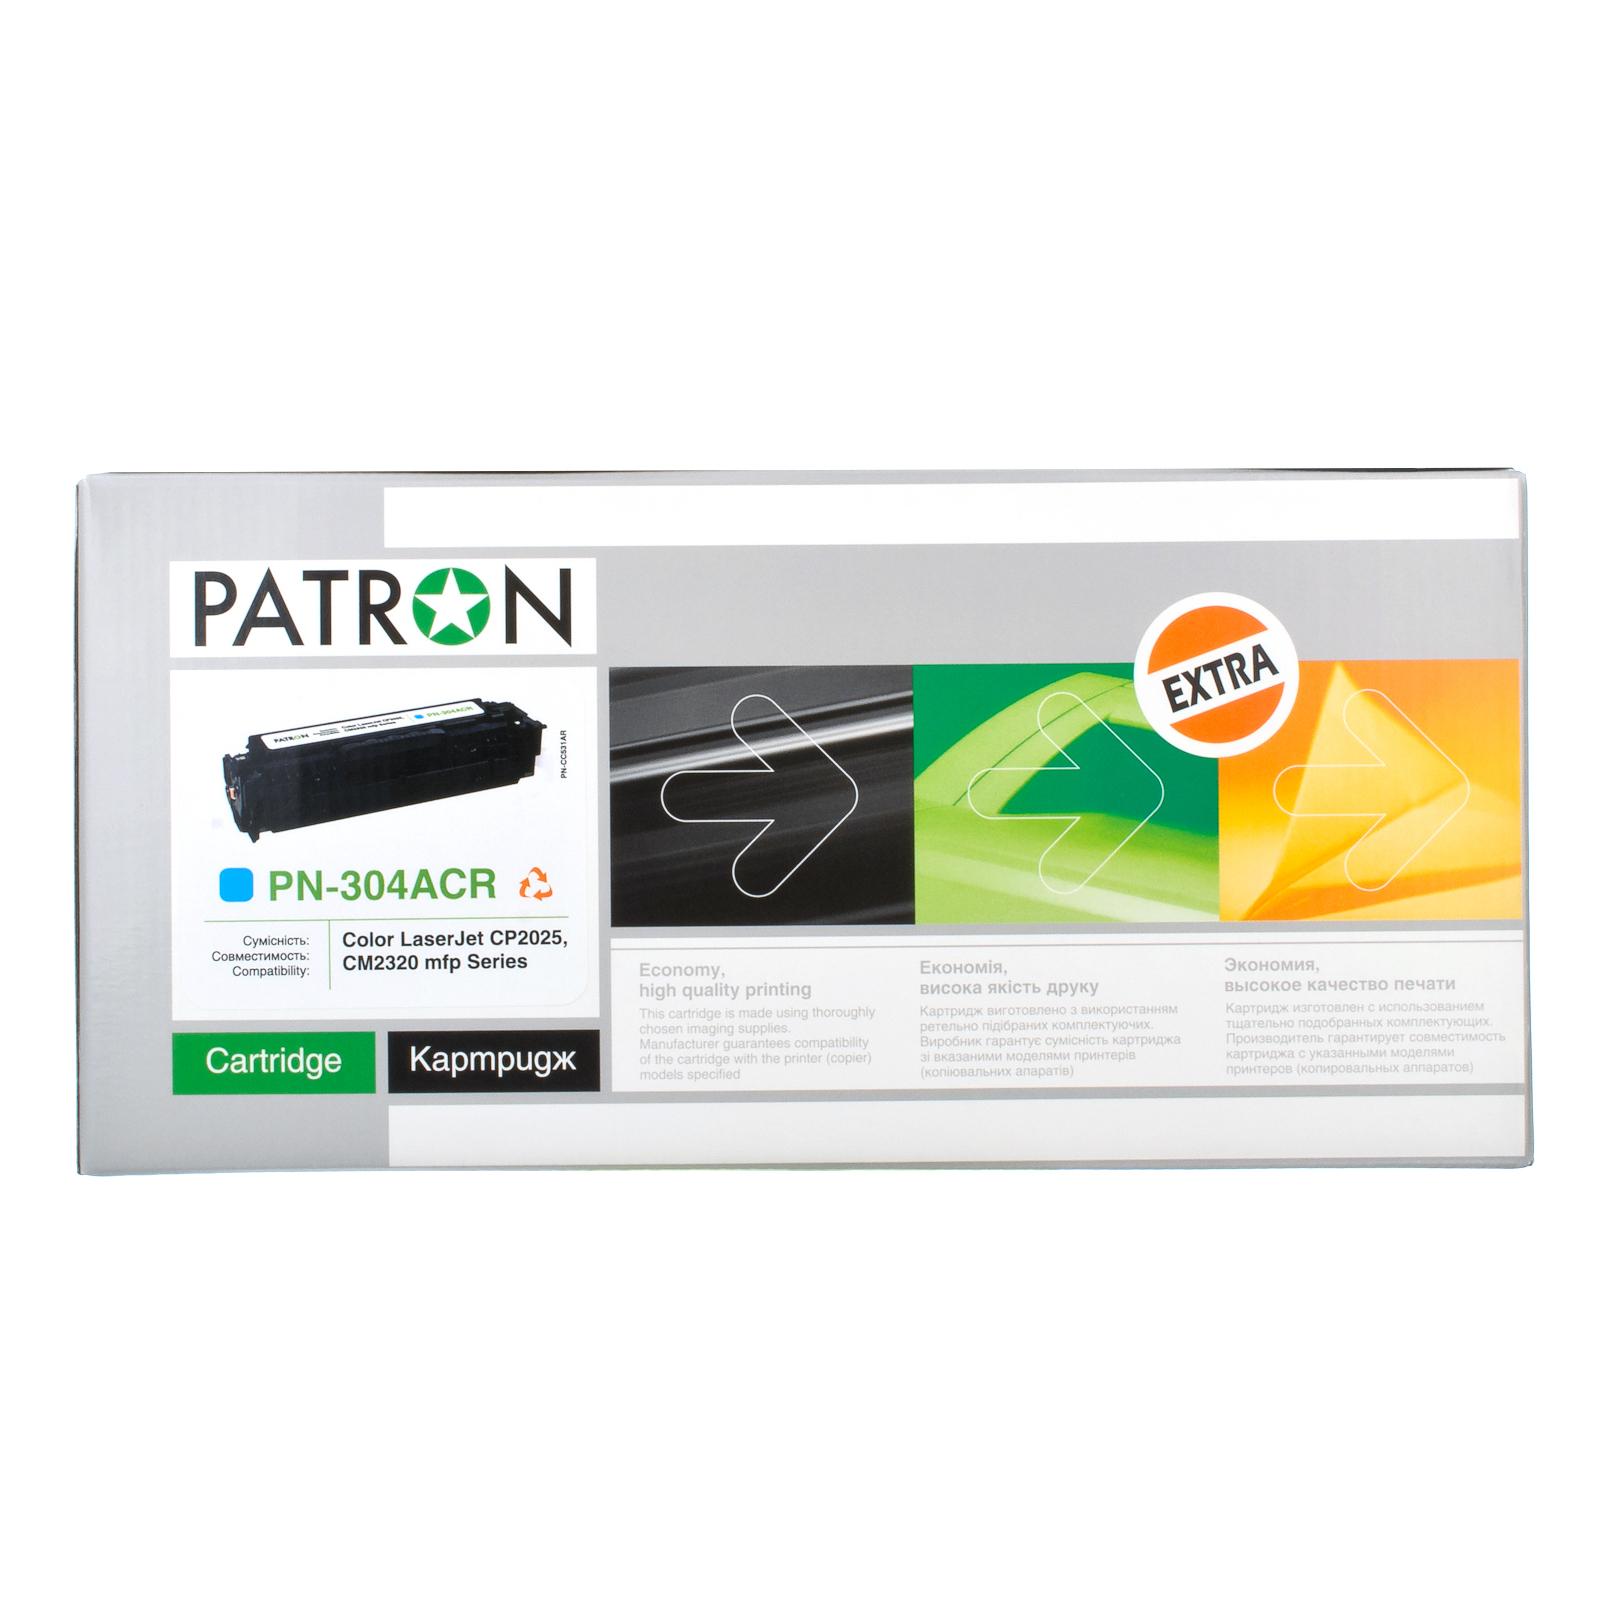 Картридж PATRON HP CLJ CP2025/ CM2320 (PN-304ACR) CYAN Extra (CT-HP-CC531A-C-PN-R) изображение 3